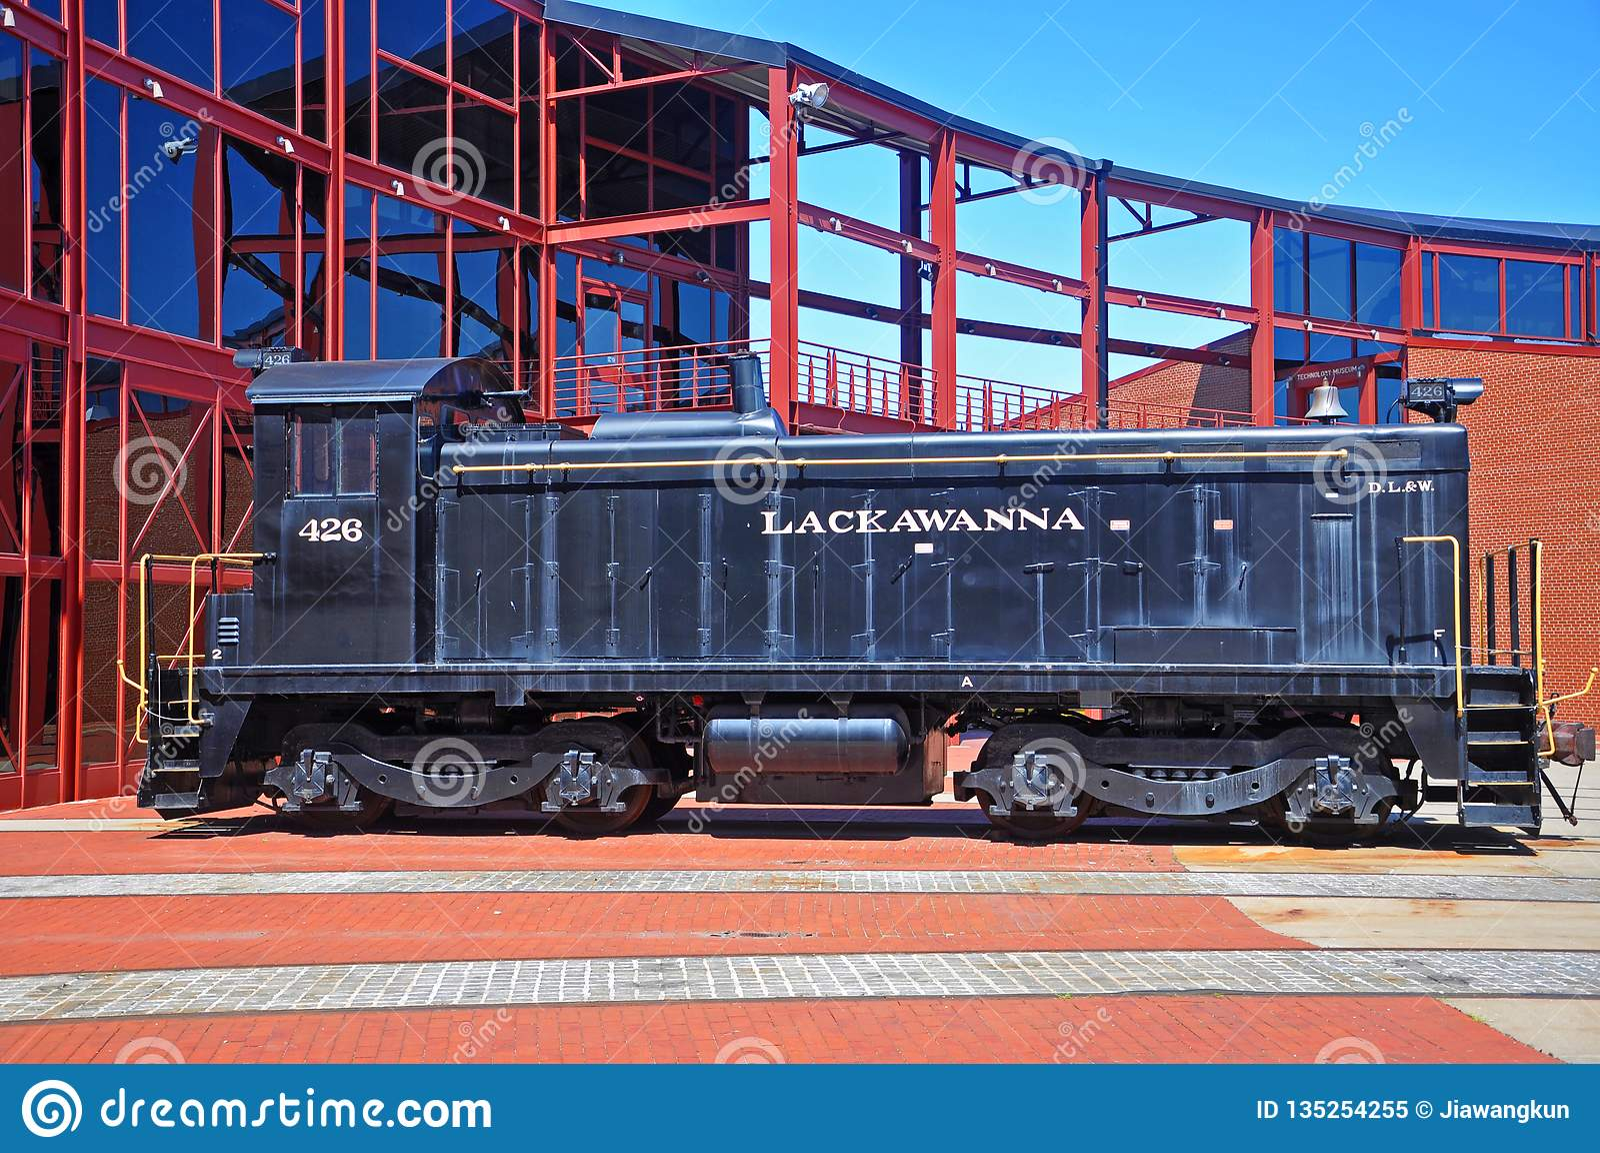 Lackawanna Railroad diesel locomotive, Scranton, PA, USA